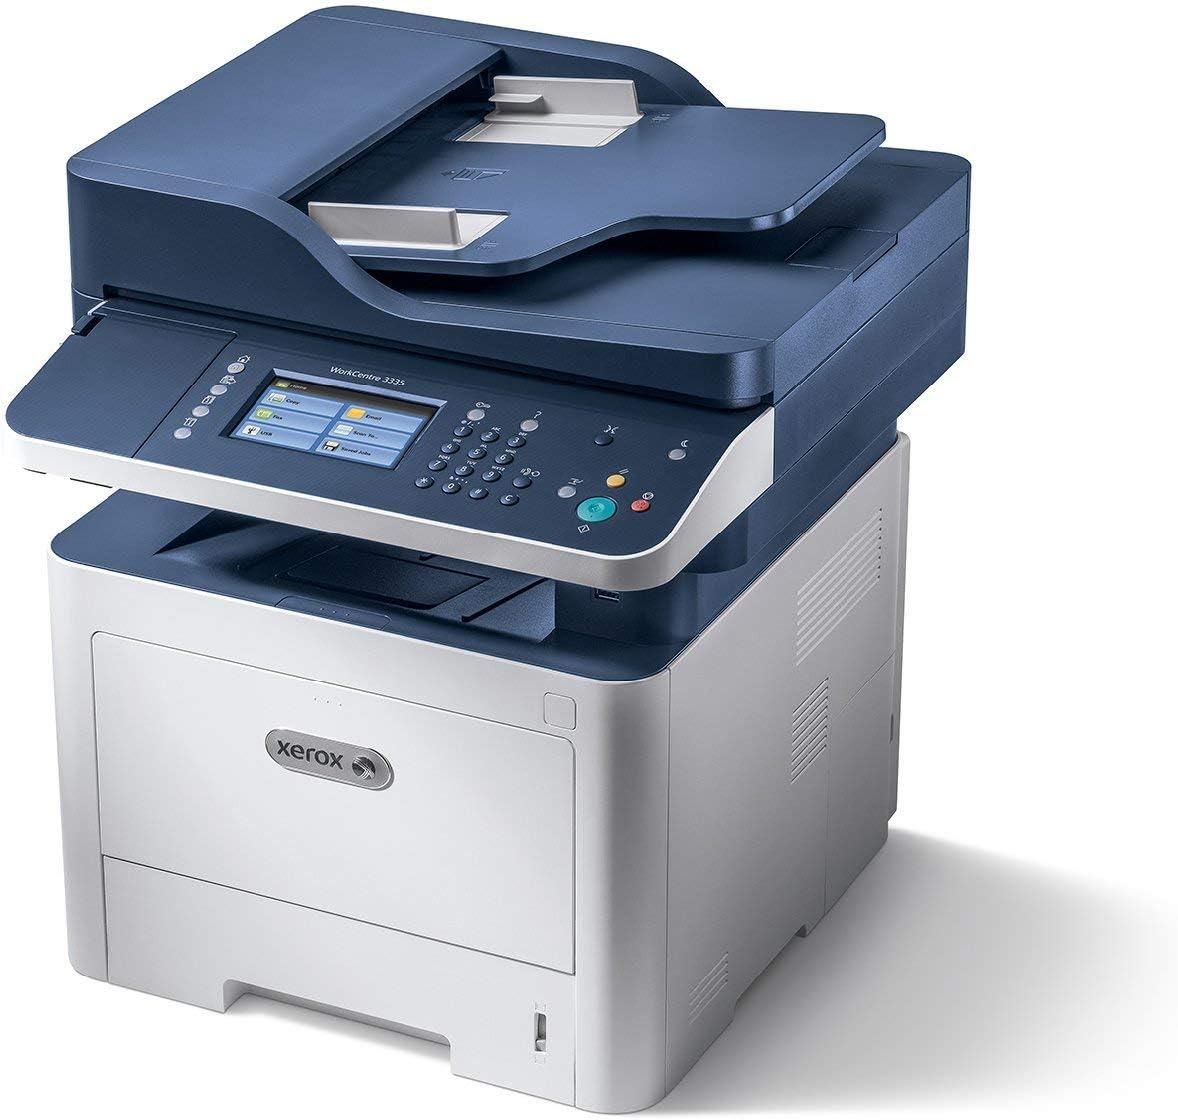 Xerox WorkCentre 3335/DNI Monochrome Multifunction Printer (Renewed)